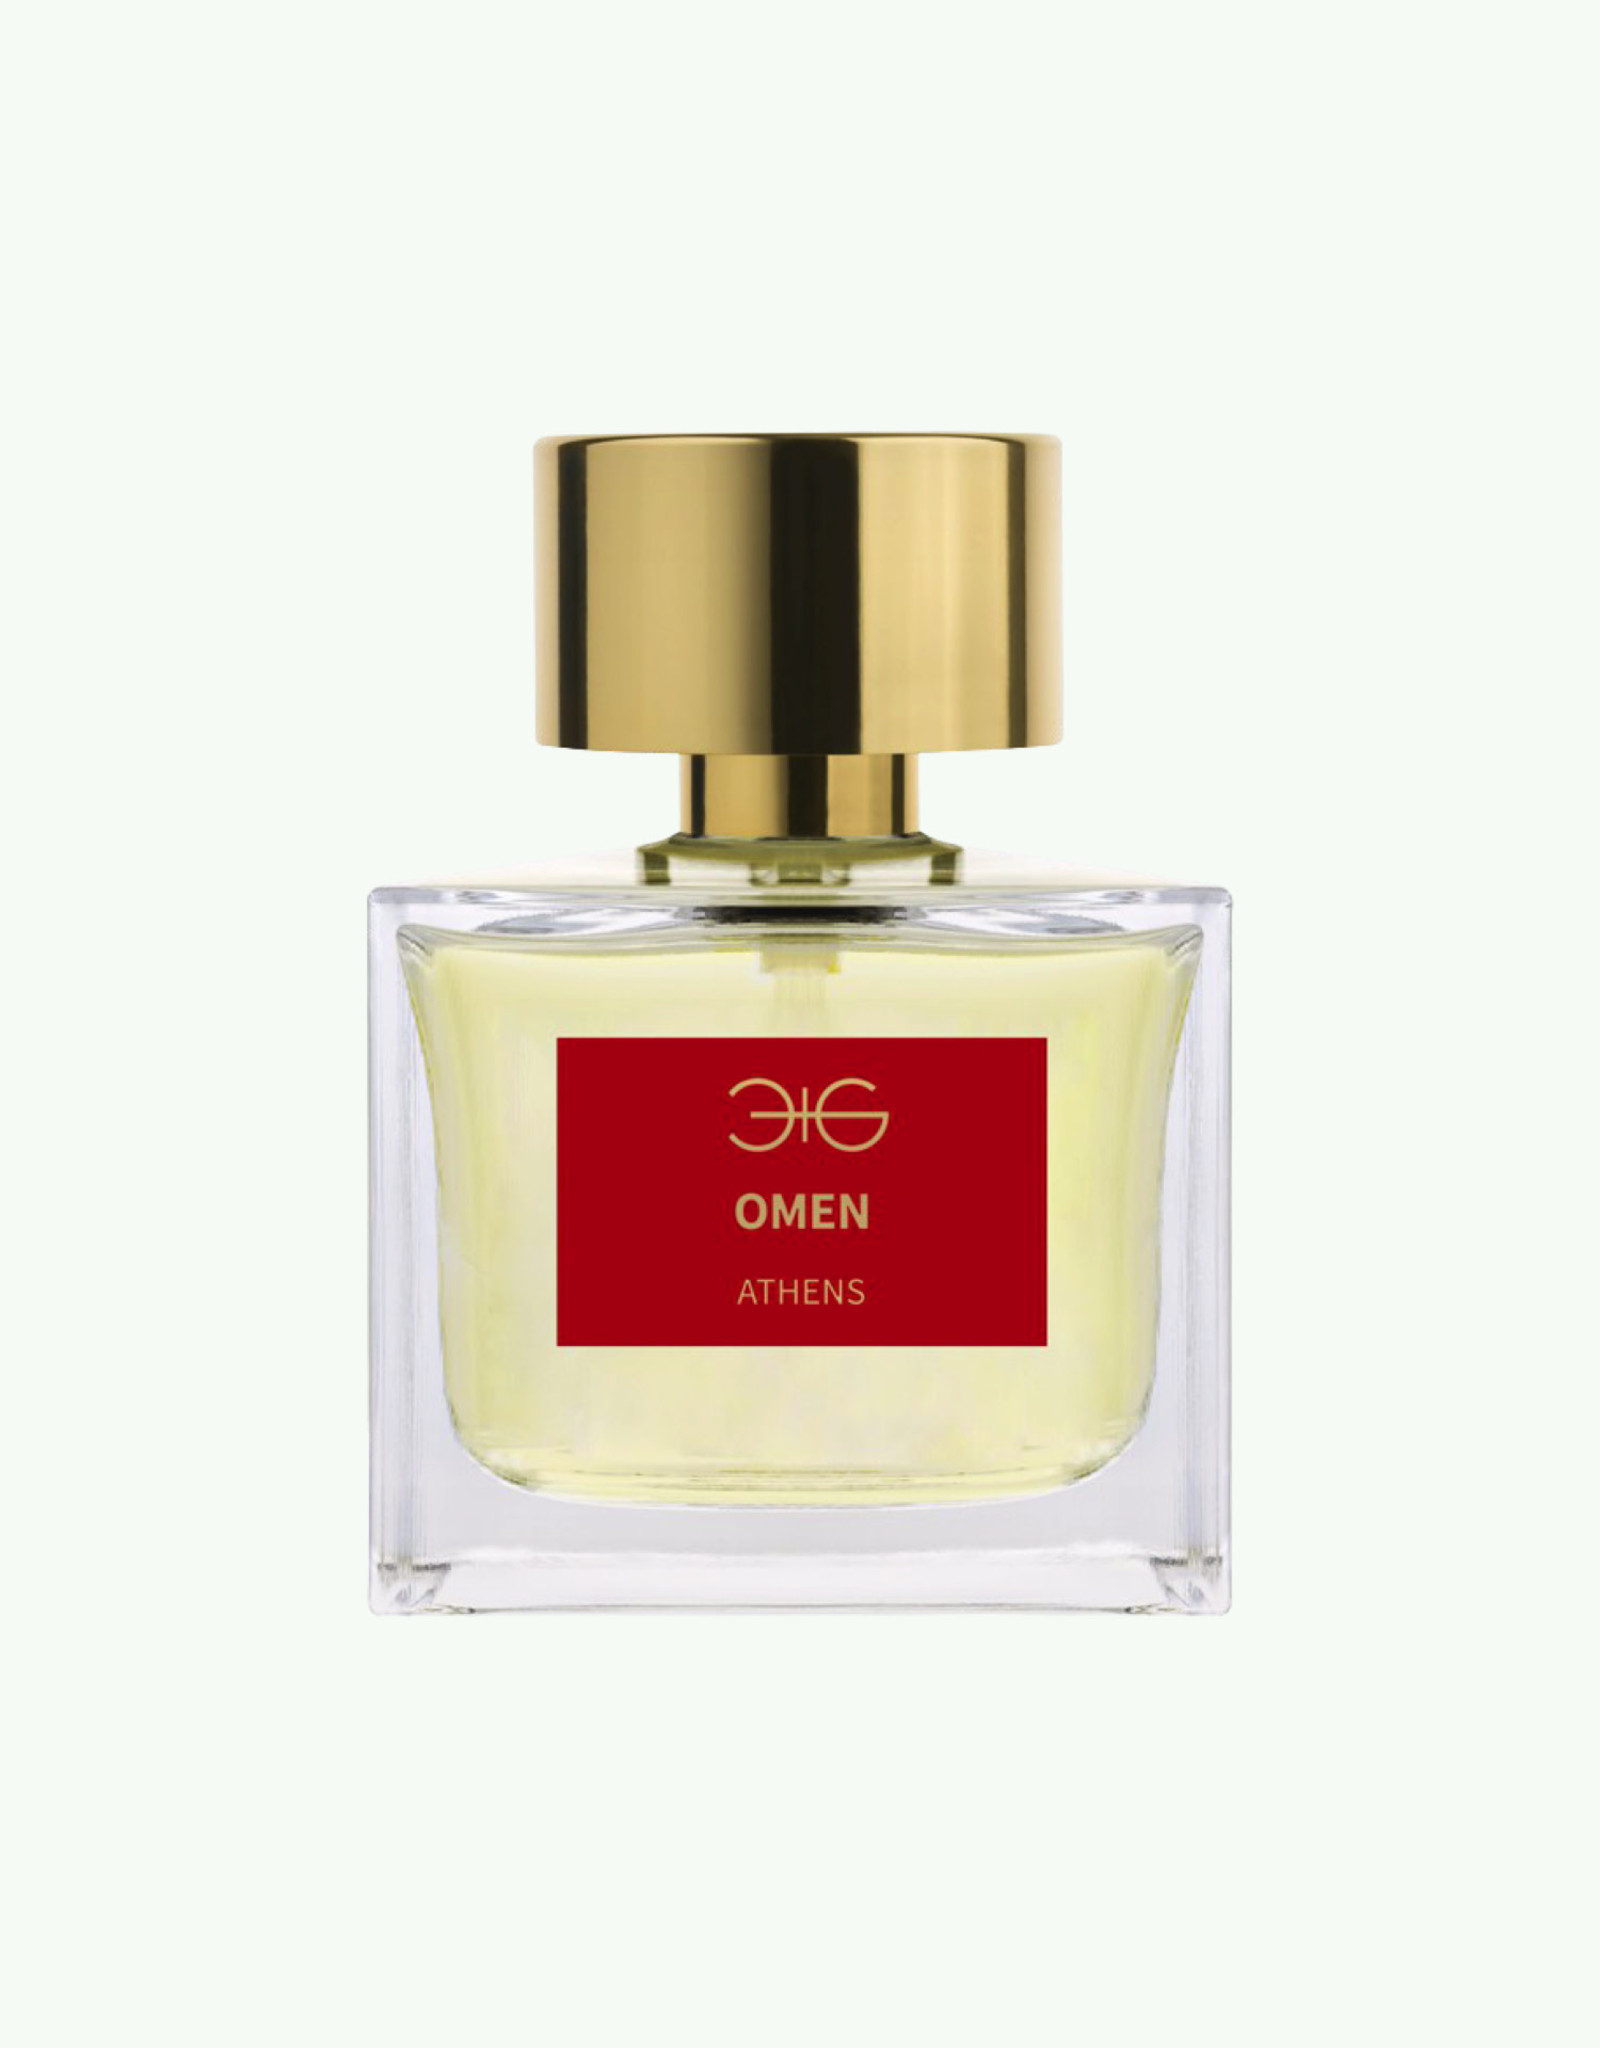 Manos Gerakinis Manos Gerakinis - Omen - Eau de Parfum